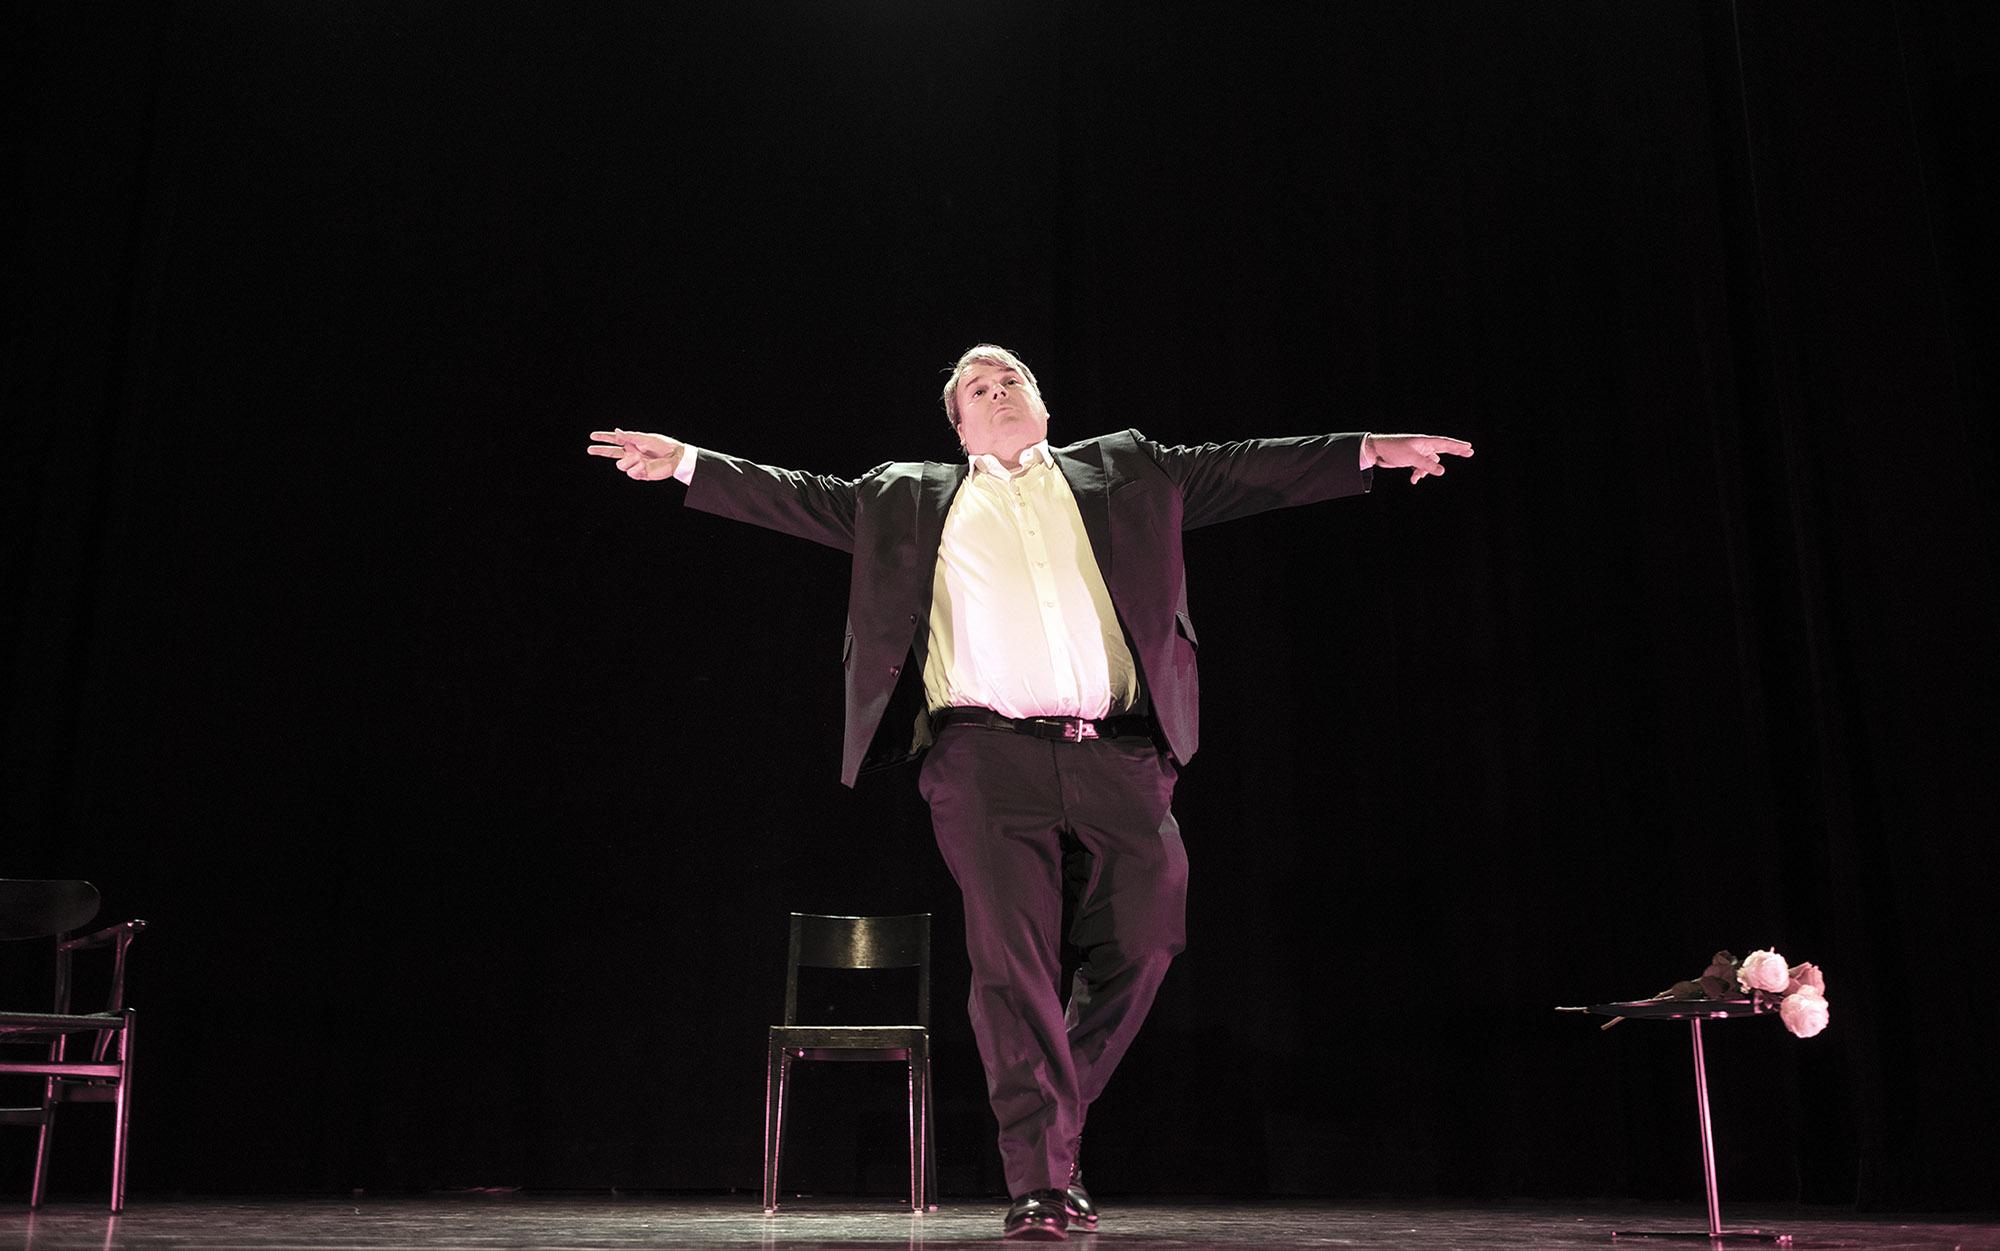 Mike Müller, Schauspieler, Kabarettist, Theater, Casino Theater Burgdorf Regie: Rafael Sanchez